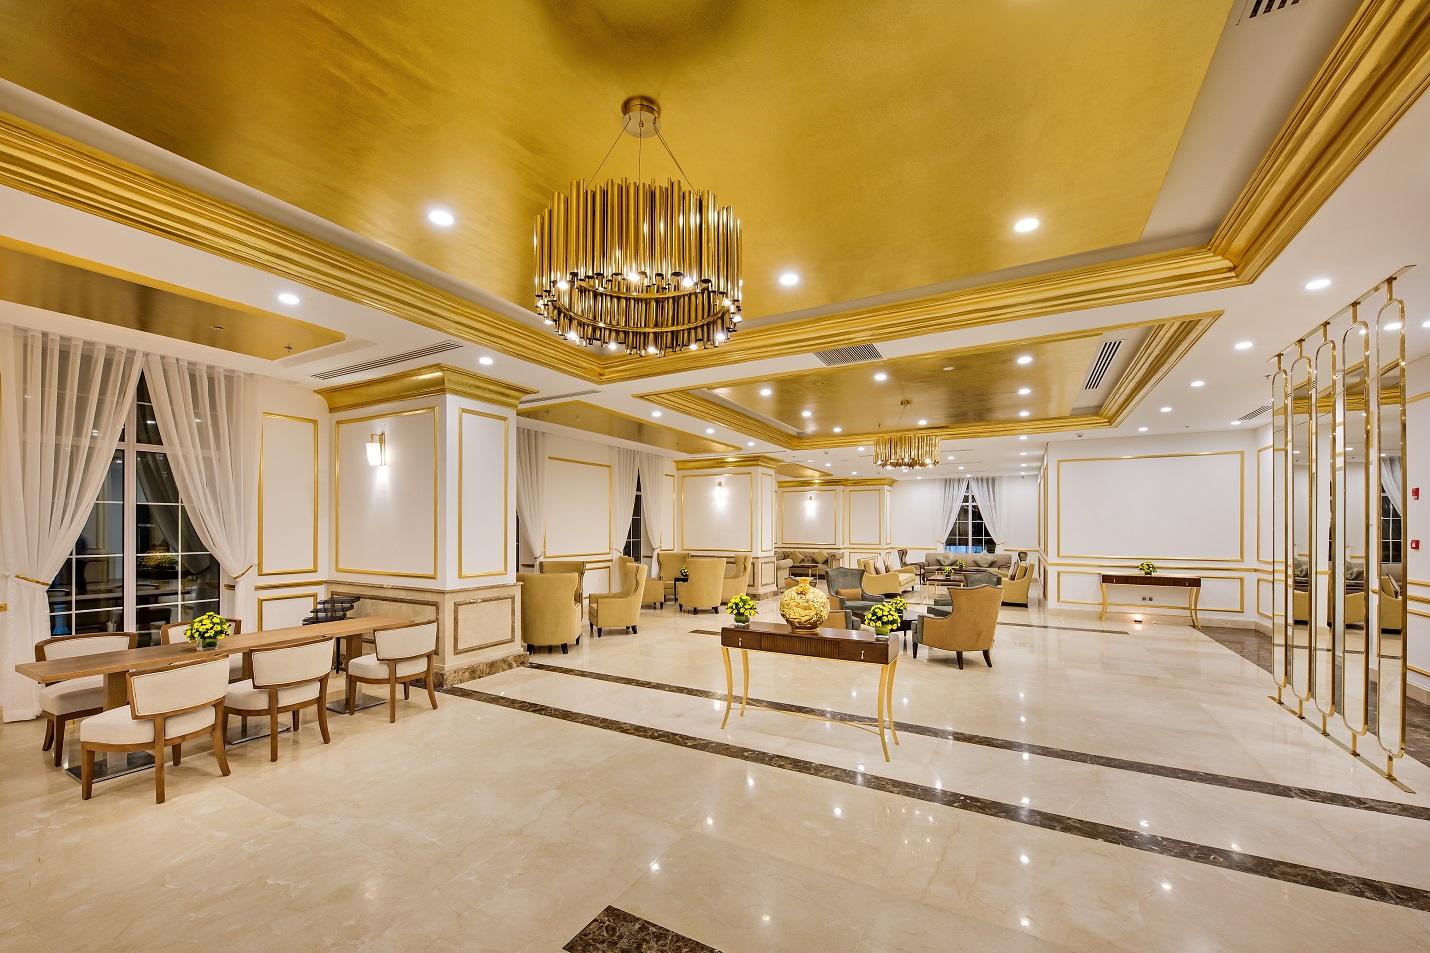 da nang golden bay